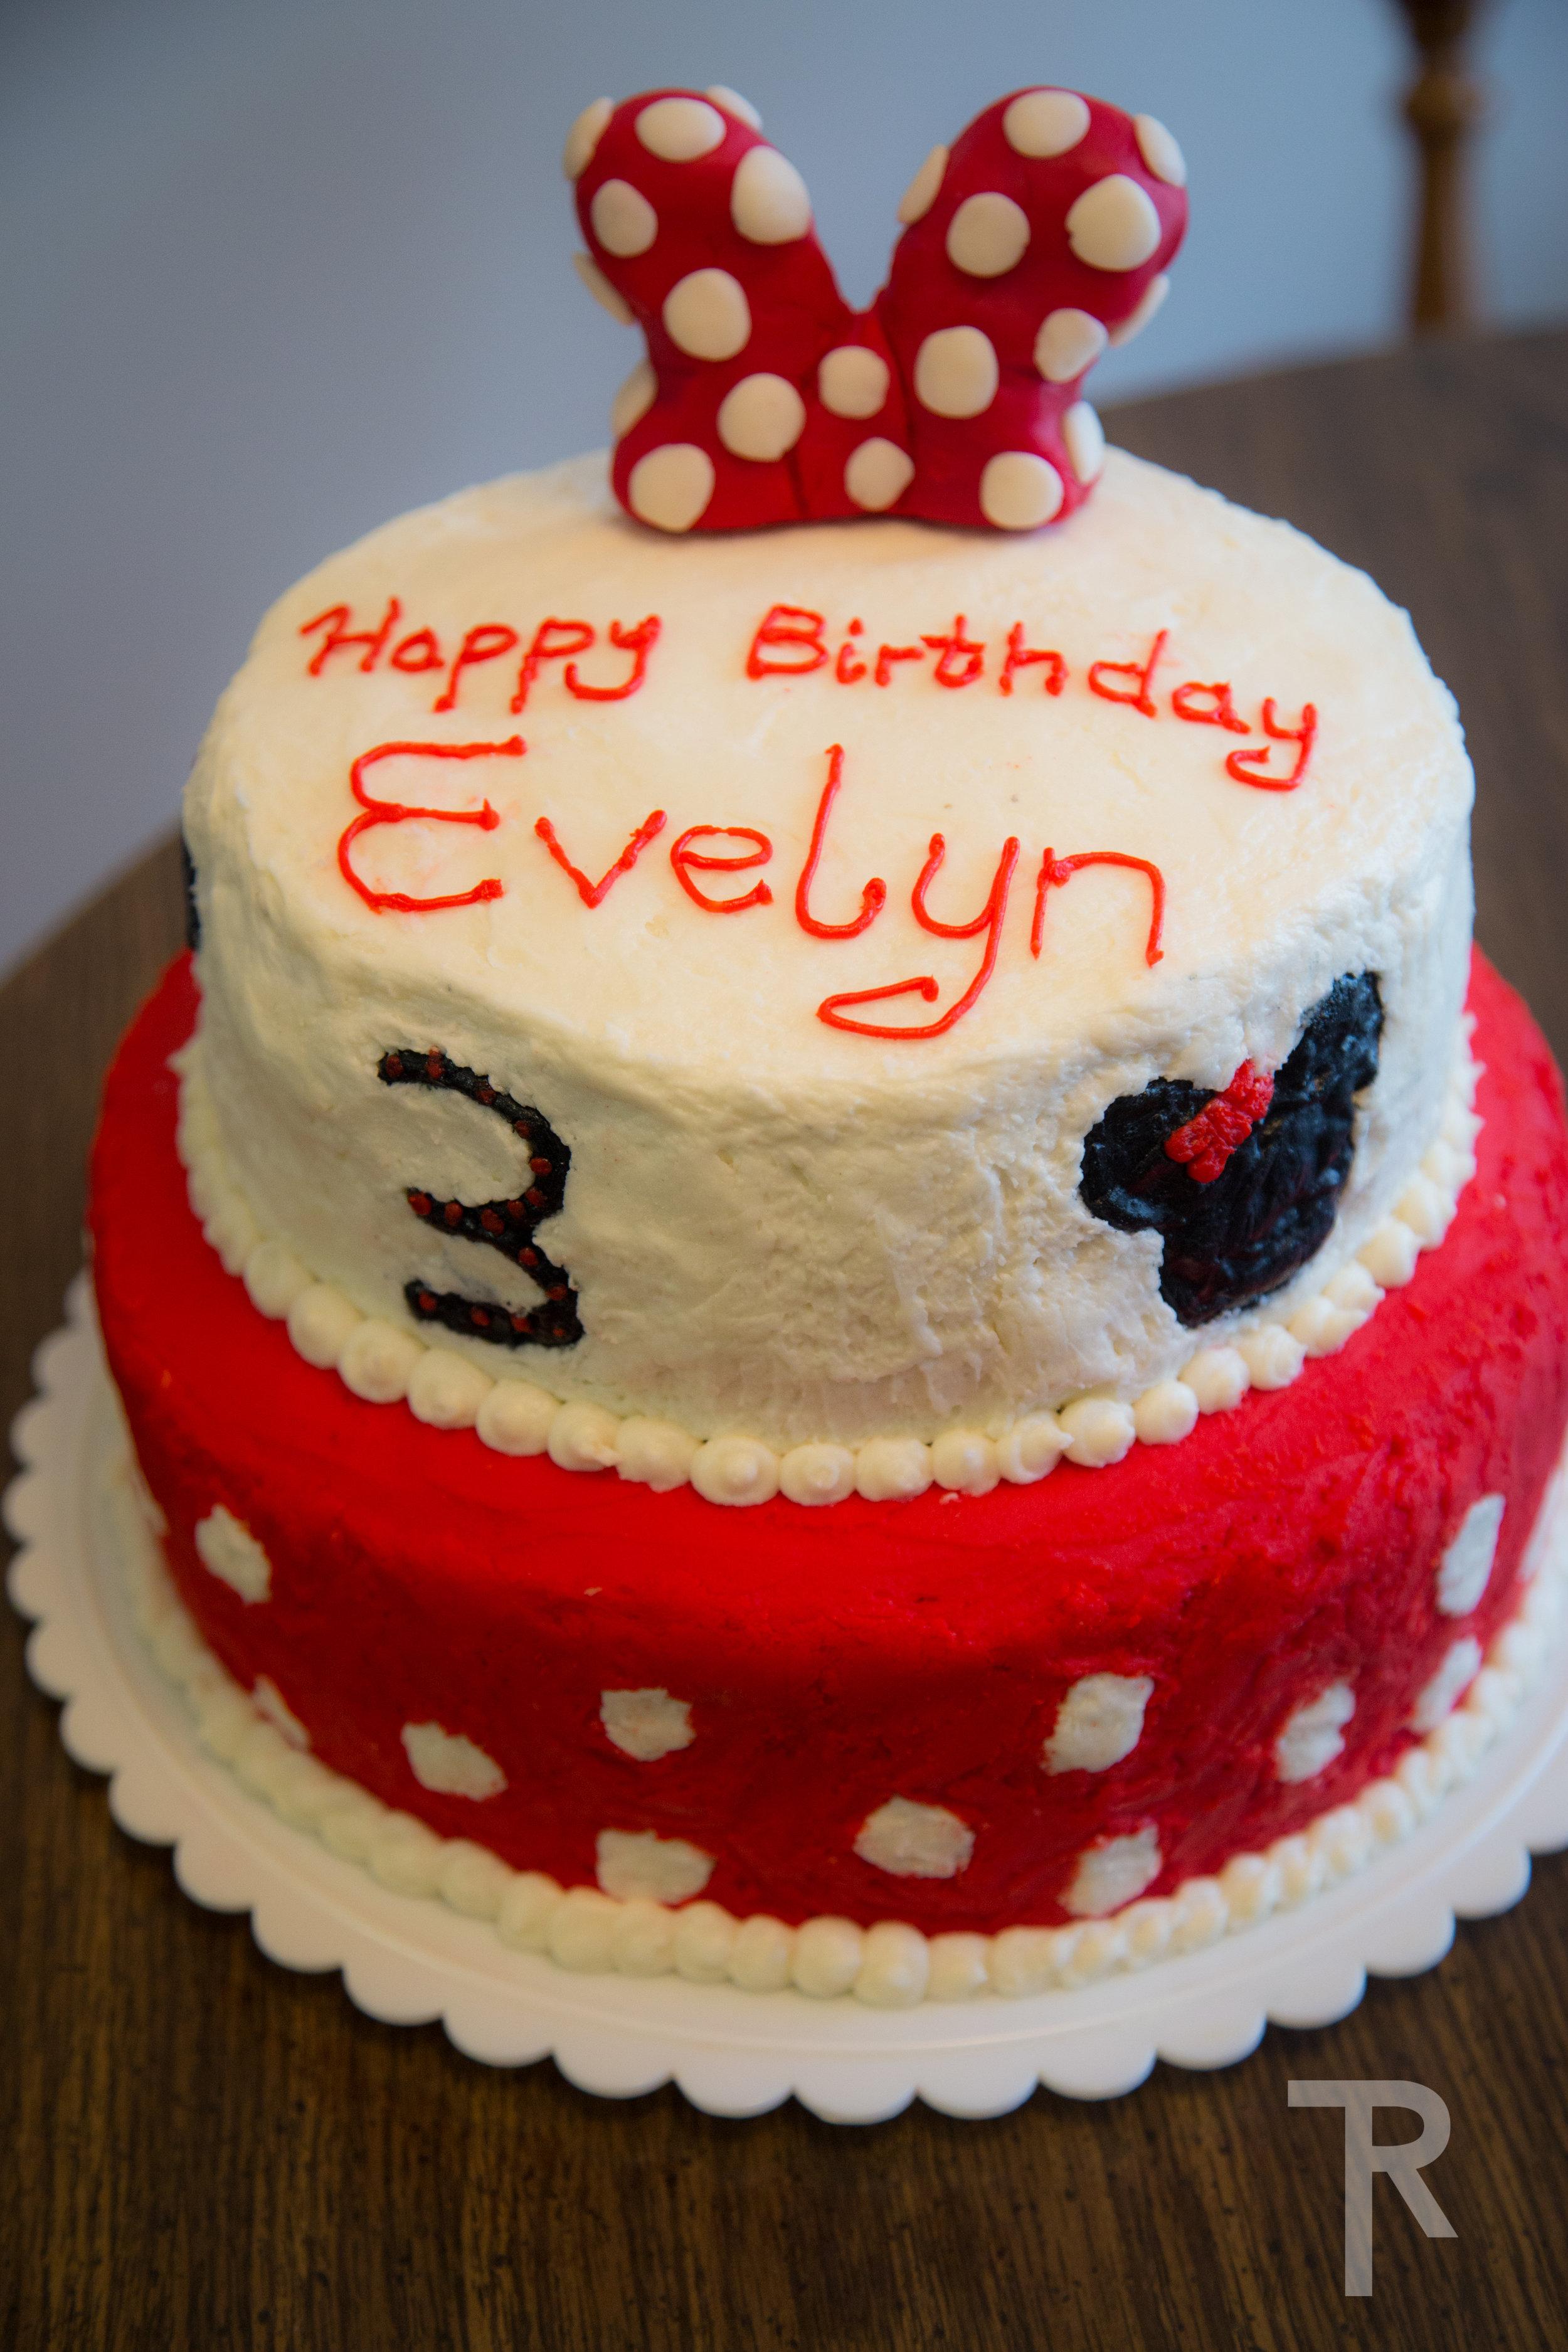 Cake-0621.jpg